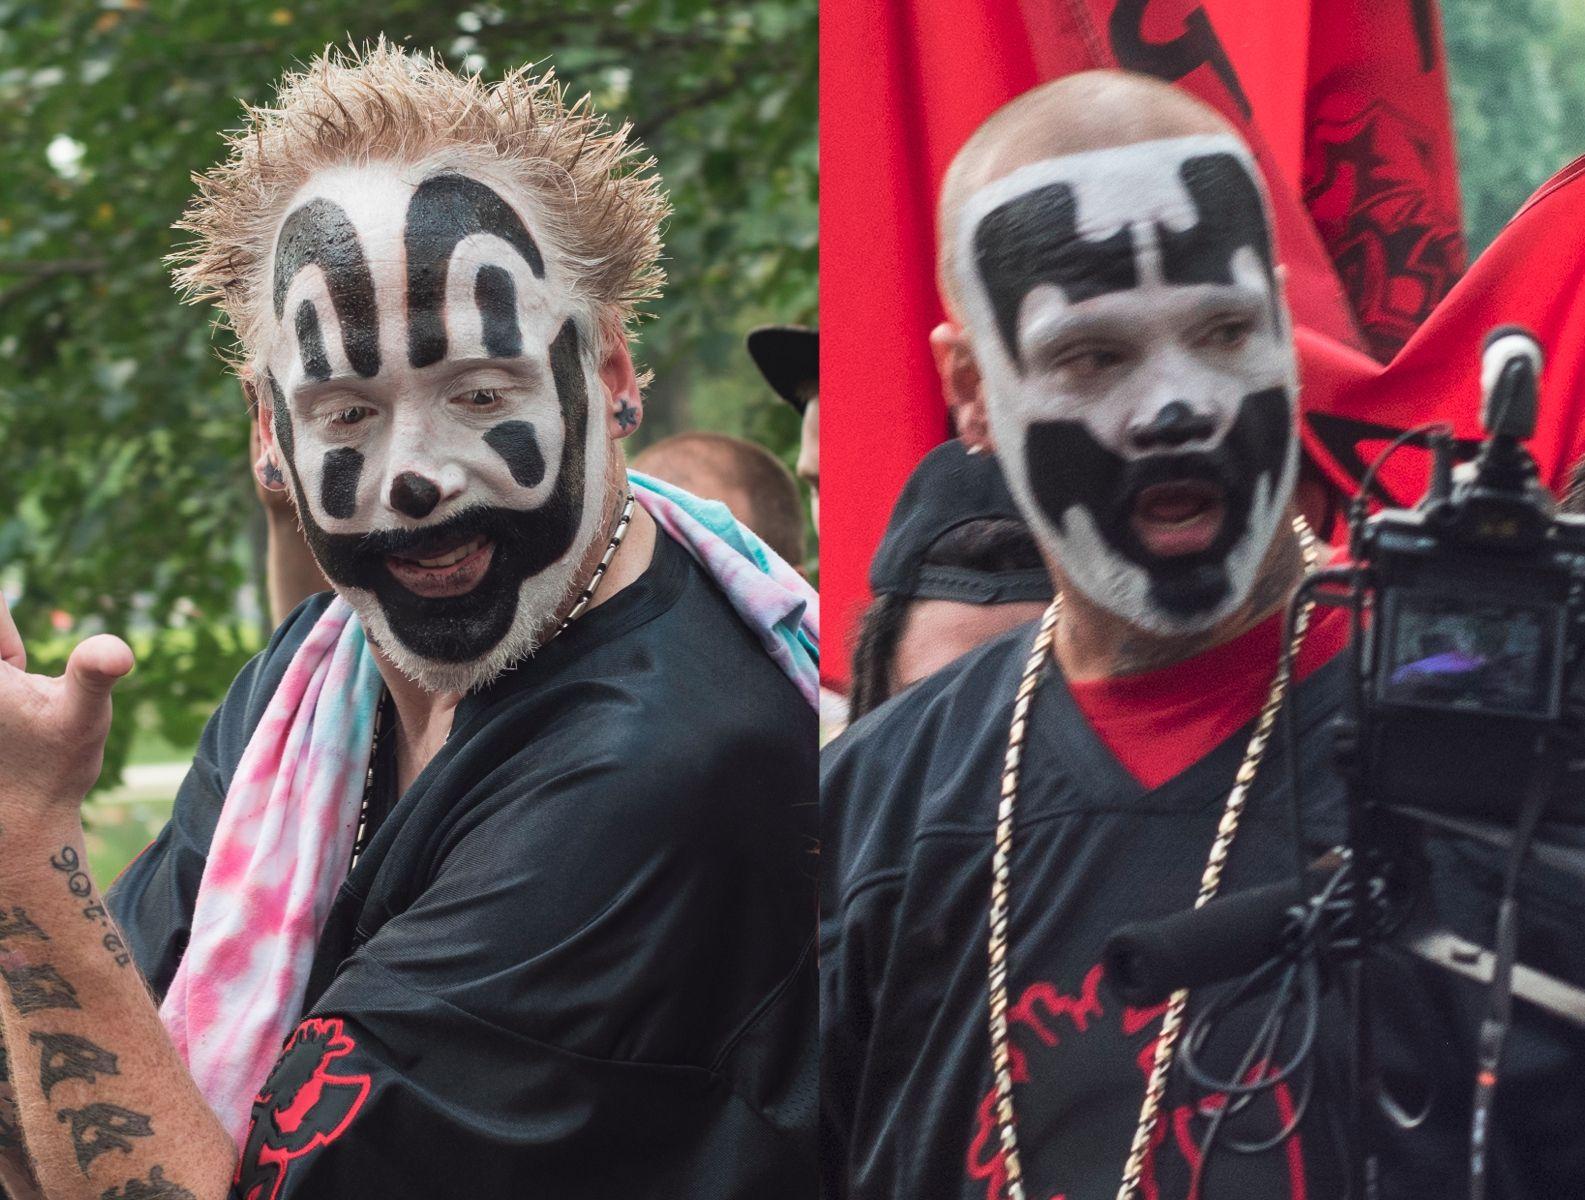 https://s3.amazonaws.com/uploads.bmxmuseum.com/user-images/37048/insane_clown_posse_2017605b65d012.jpg